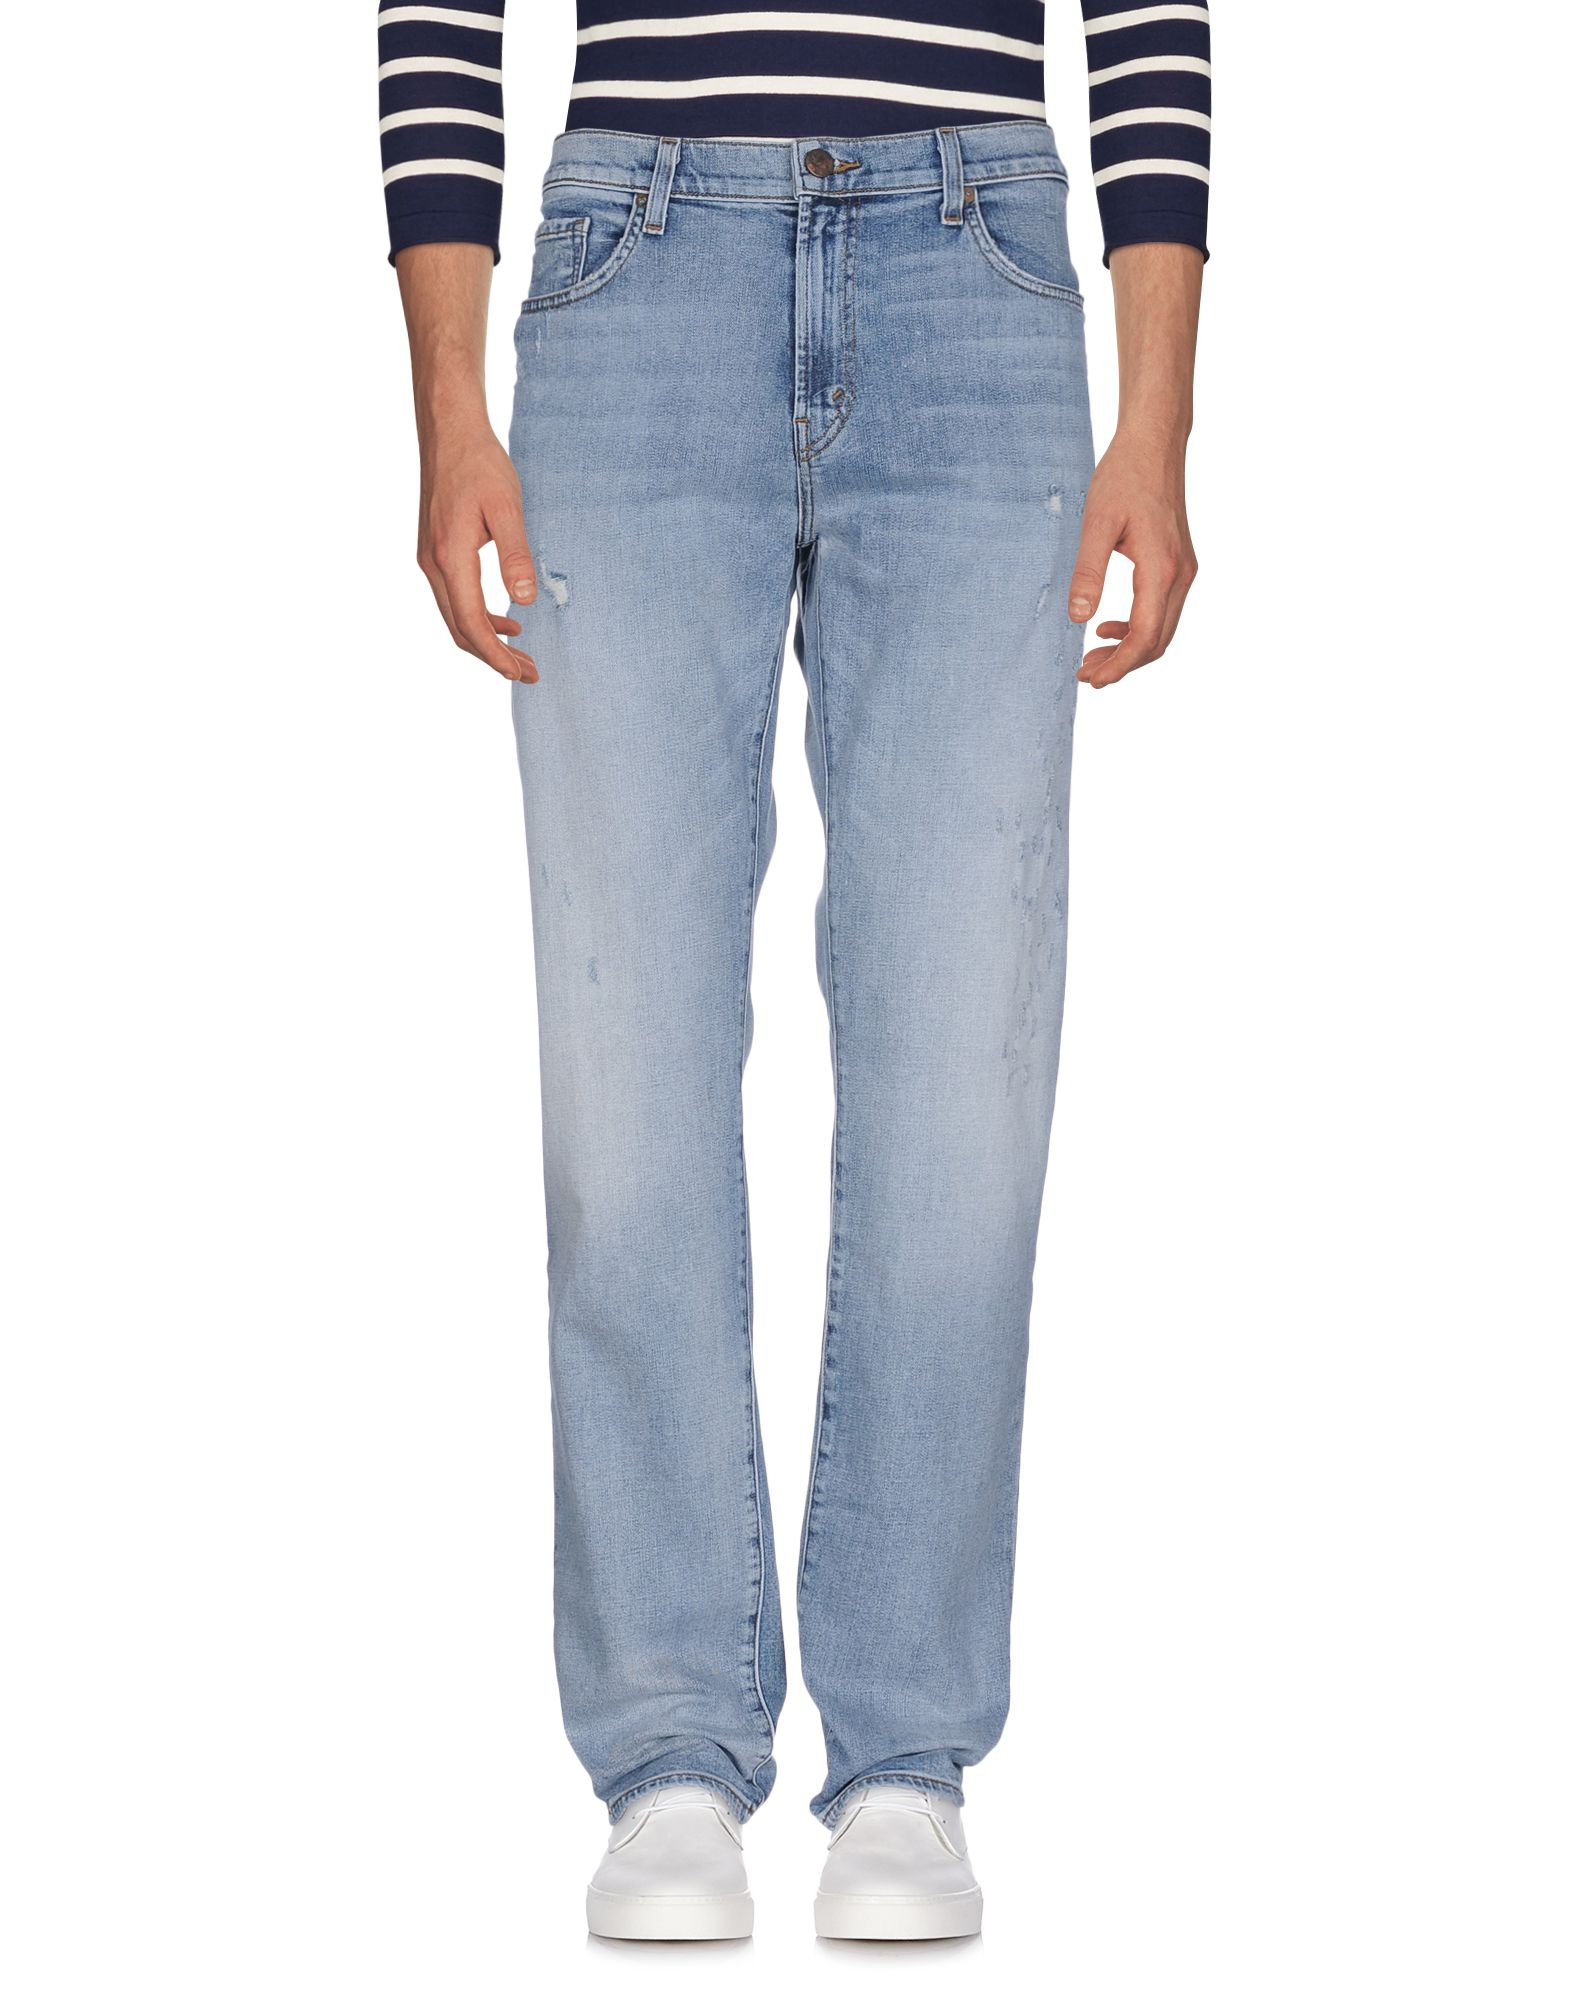 Pantaloni Jeans J J Jeans Brand Uomo - 42632983SS ddaea2